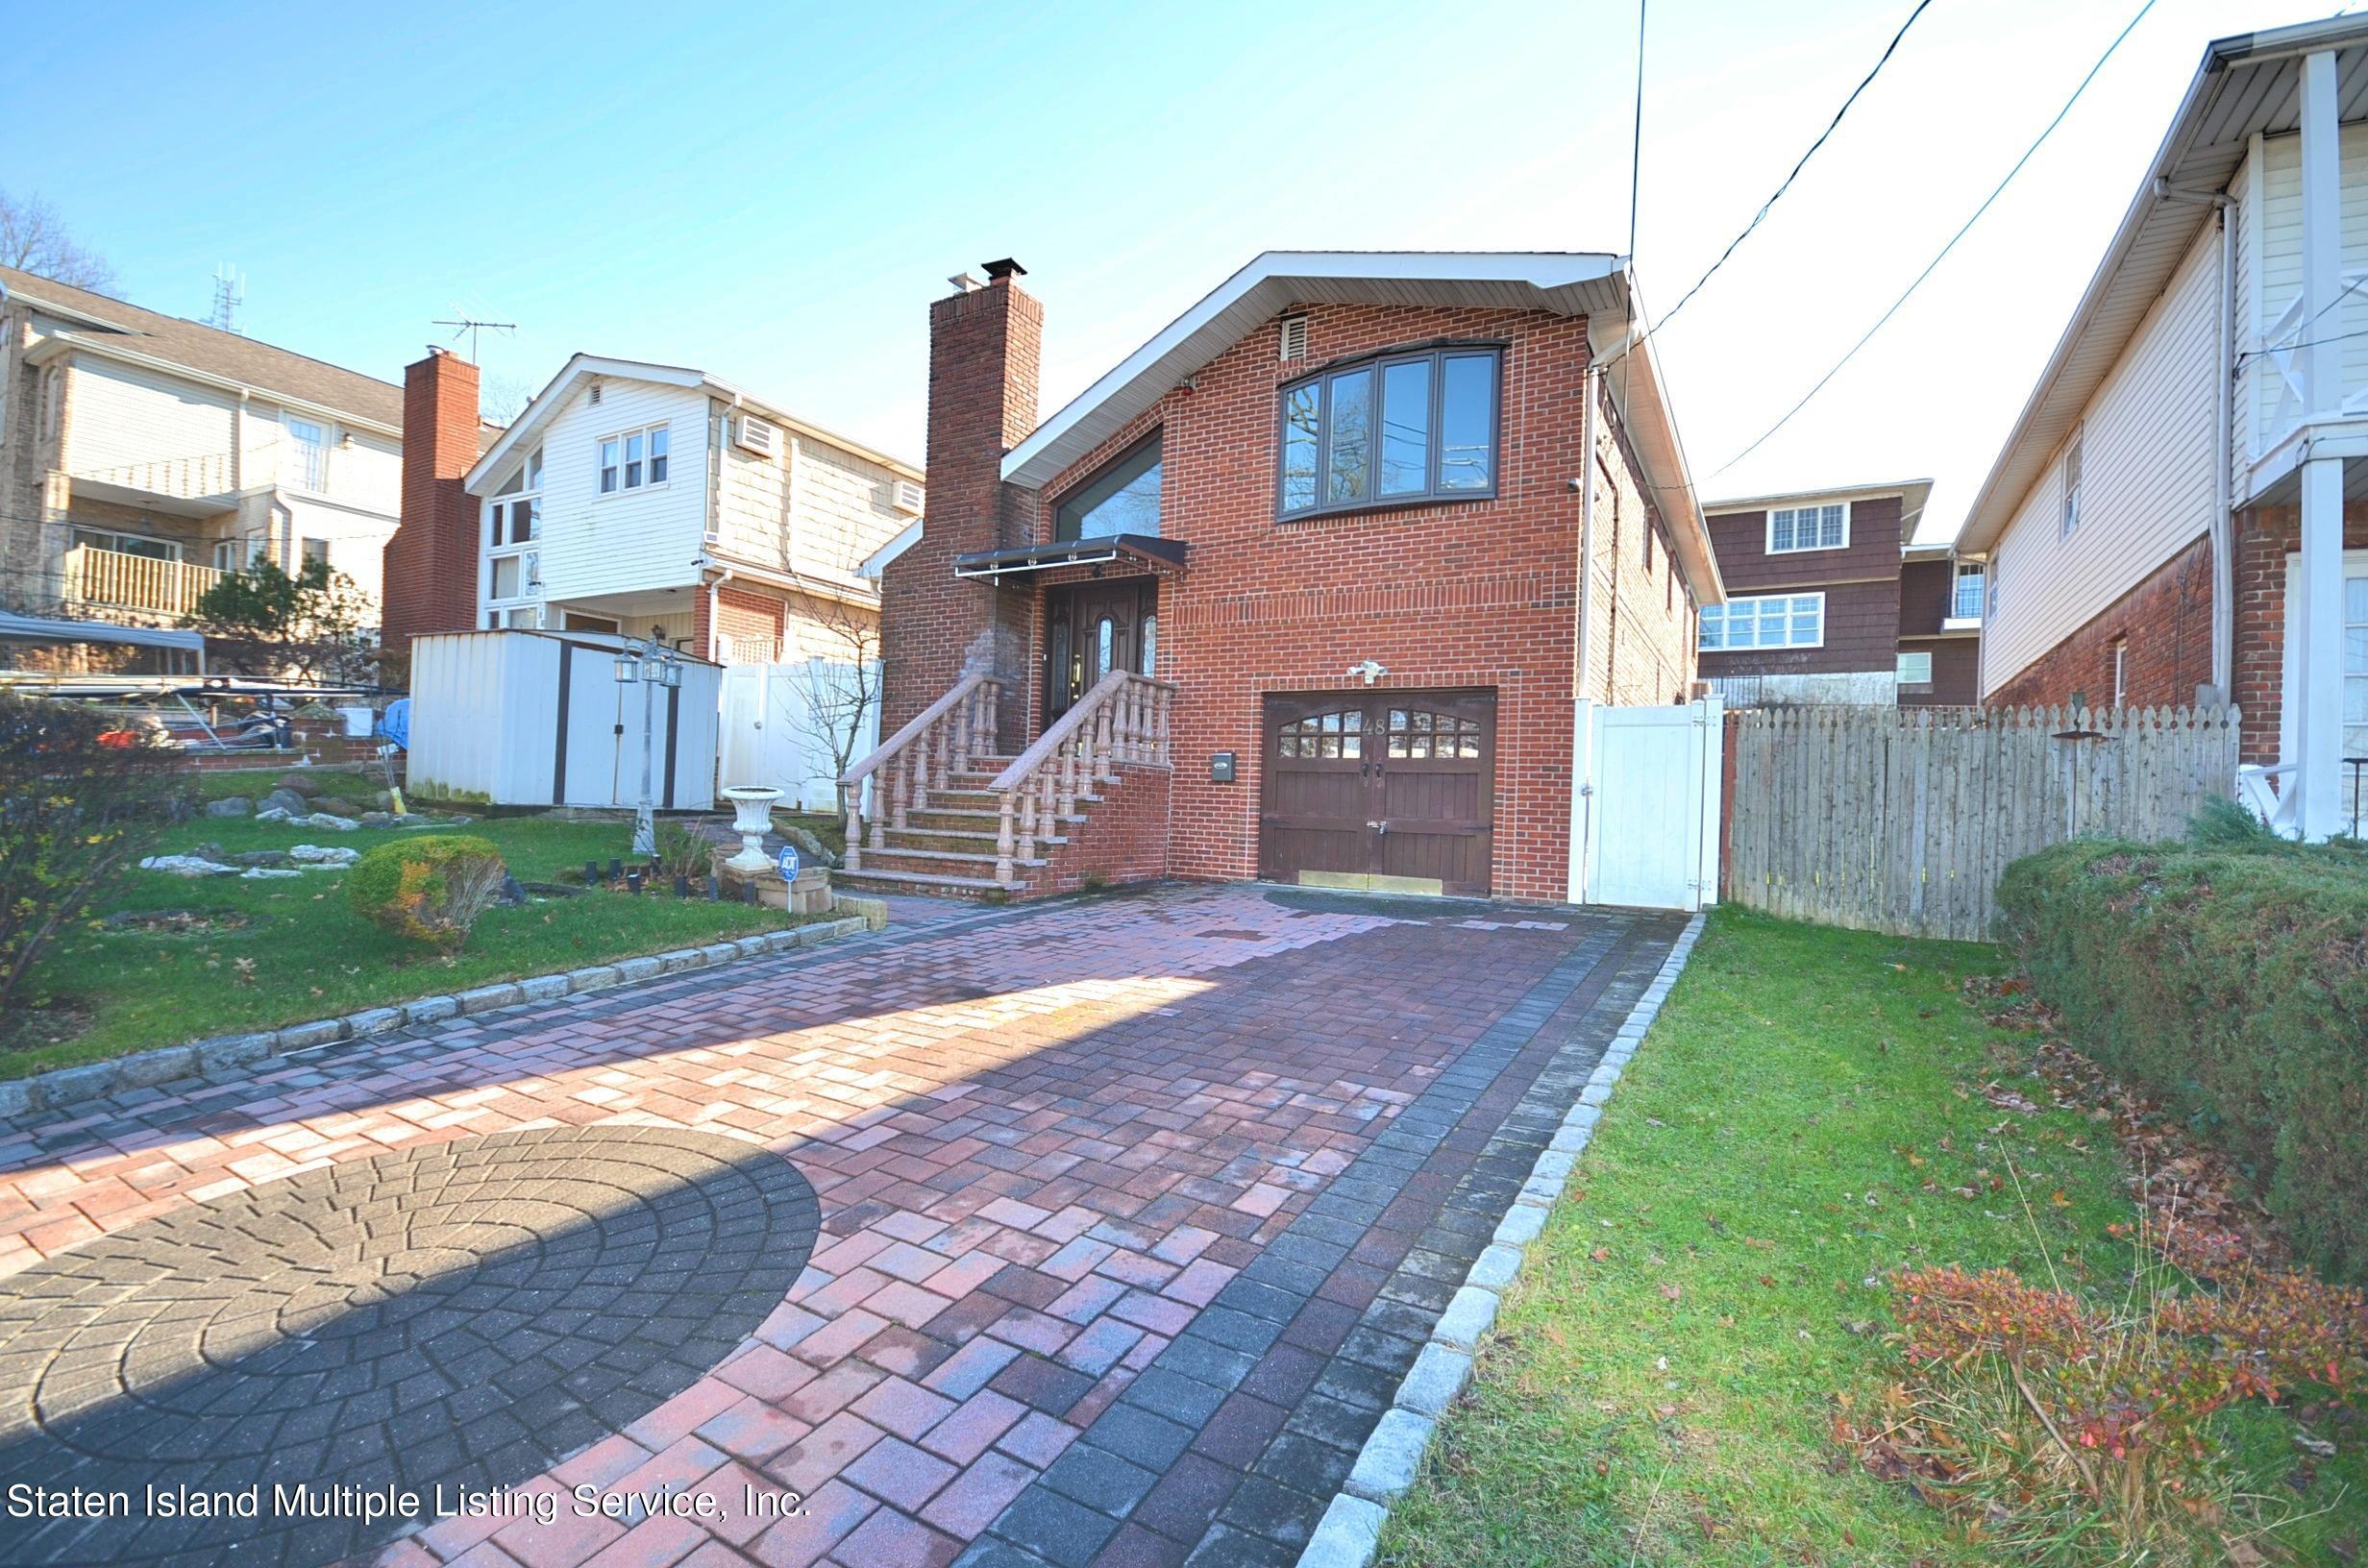 Single Family - Detached 48 Ocean Terrace  Staten Island, NY 10314, MLS-1142240-4